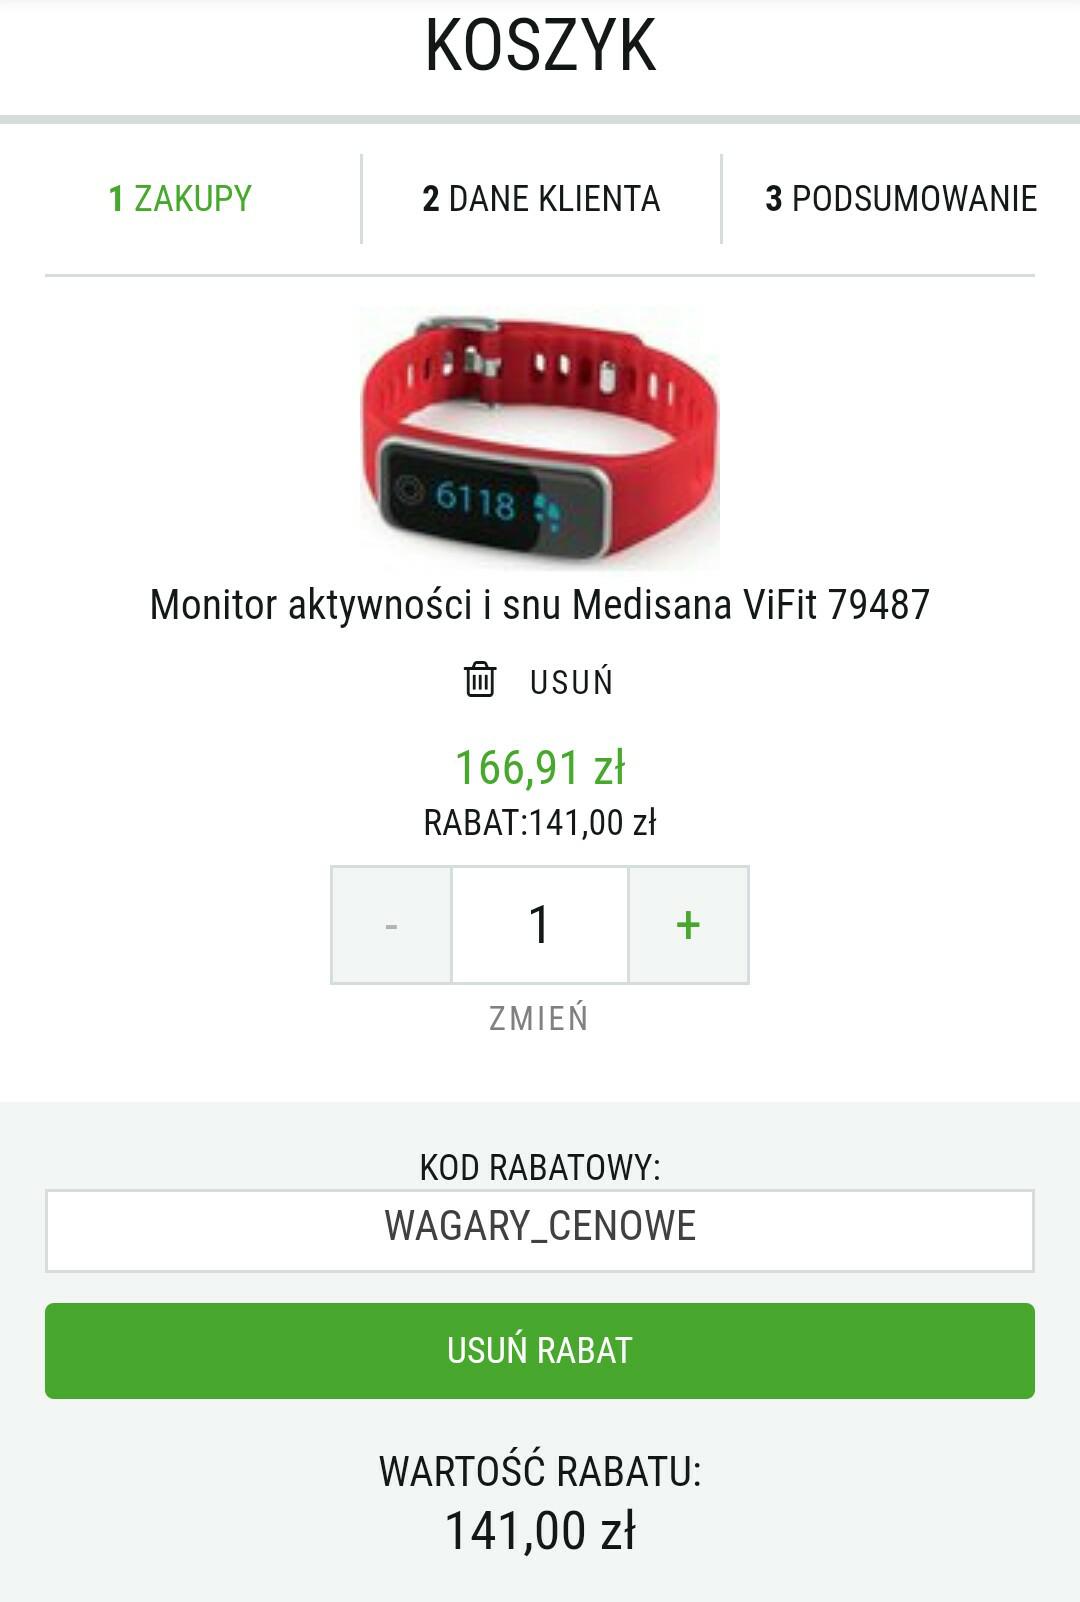 Medisana ViFit 79487 monitor aktywności i snu za 25,91zł. Polar A300 HR za 394,92zł!